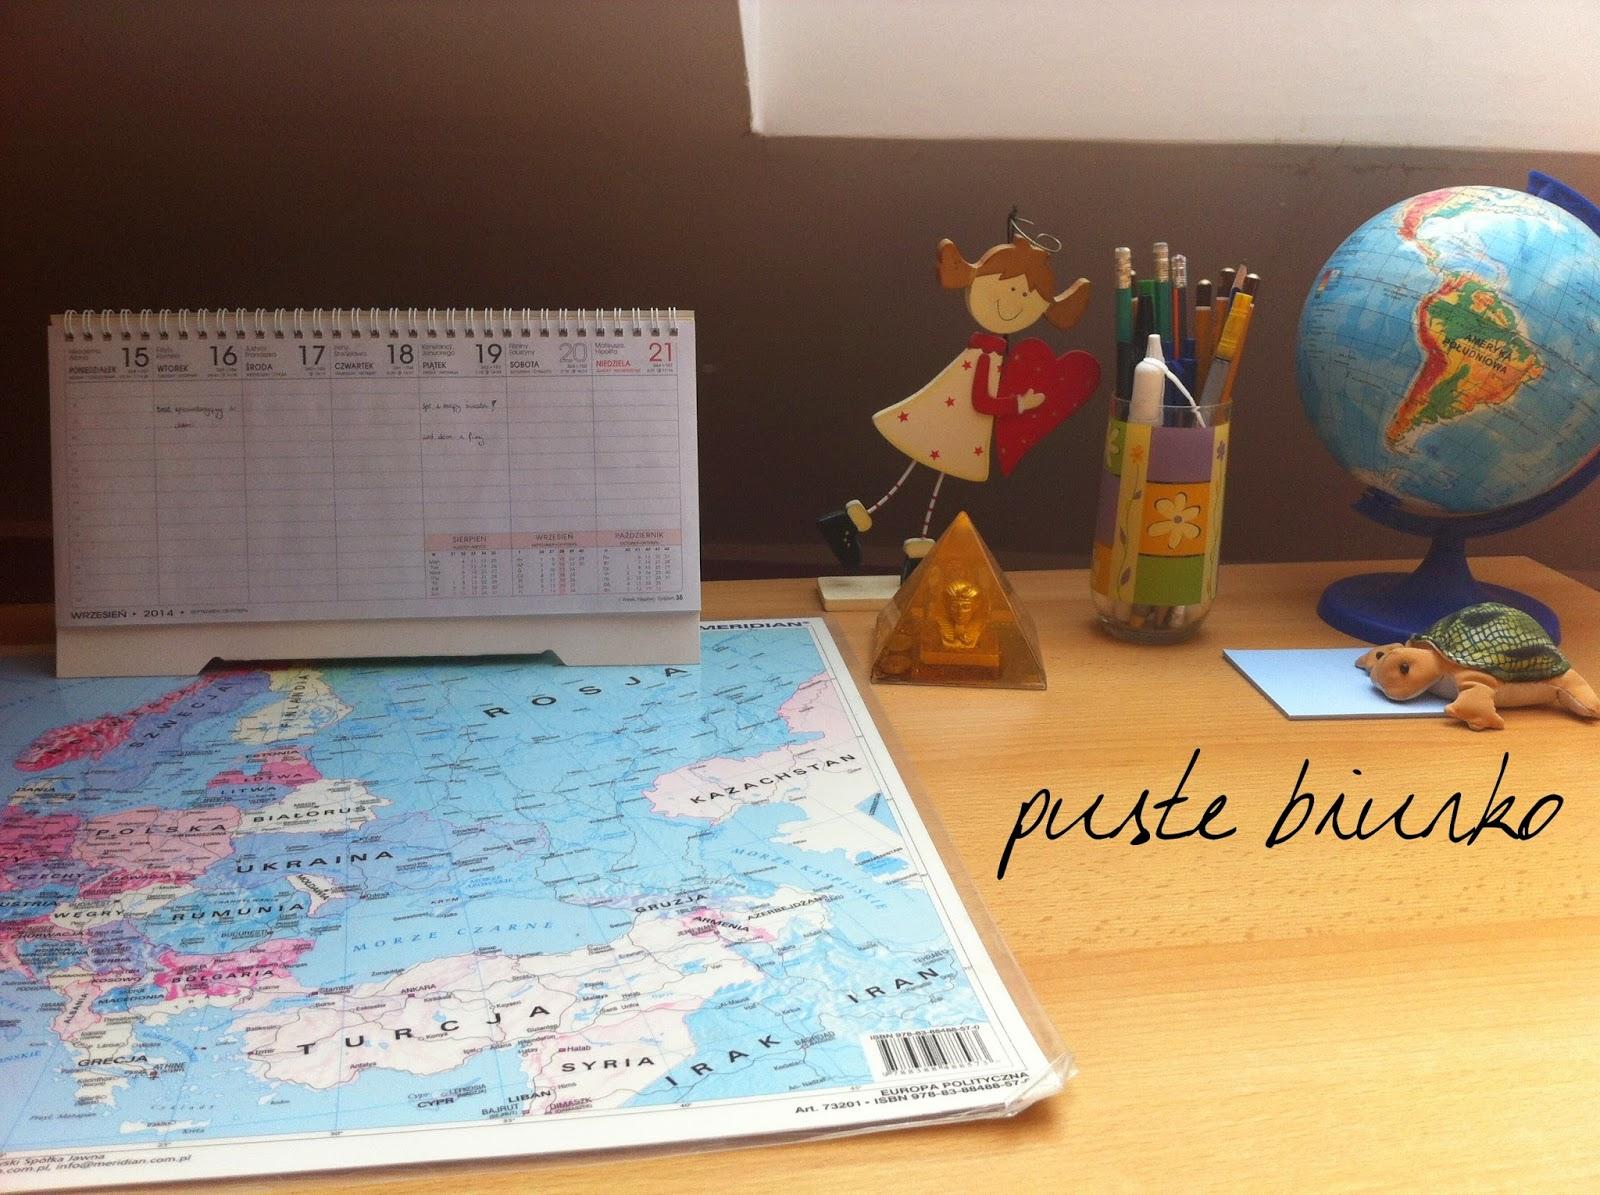 posprzątane, puste biurko | kalendarz, mapa europy